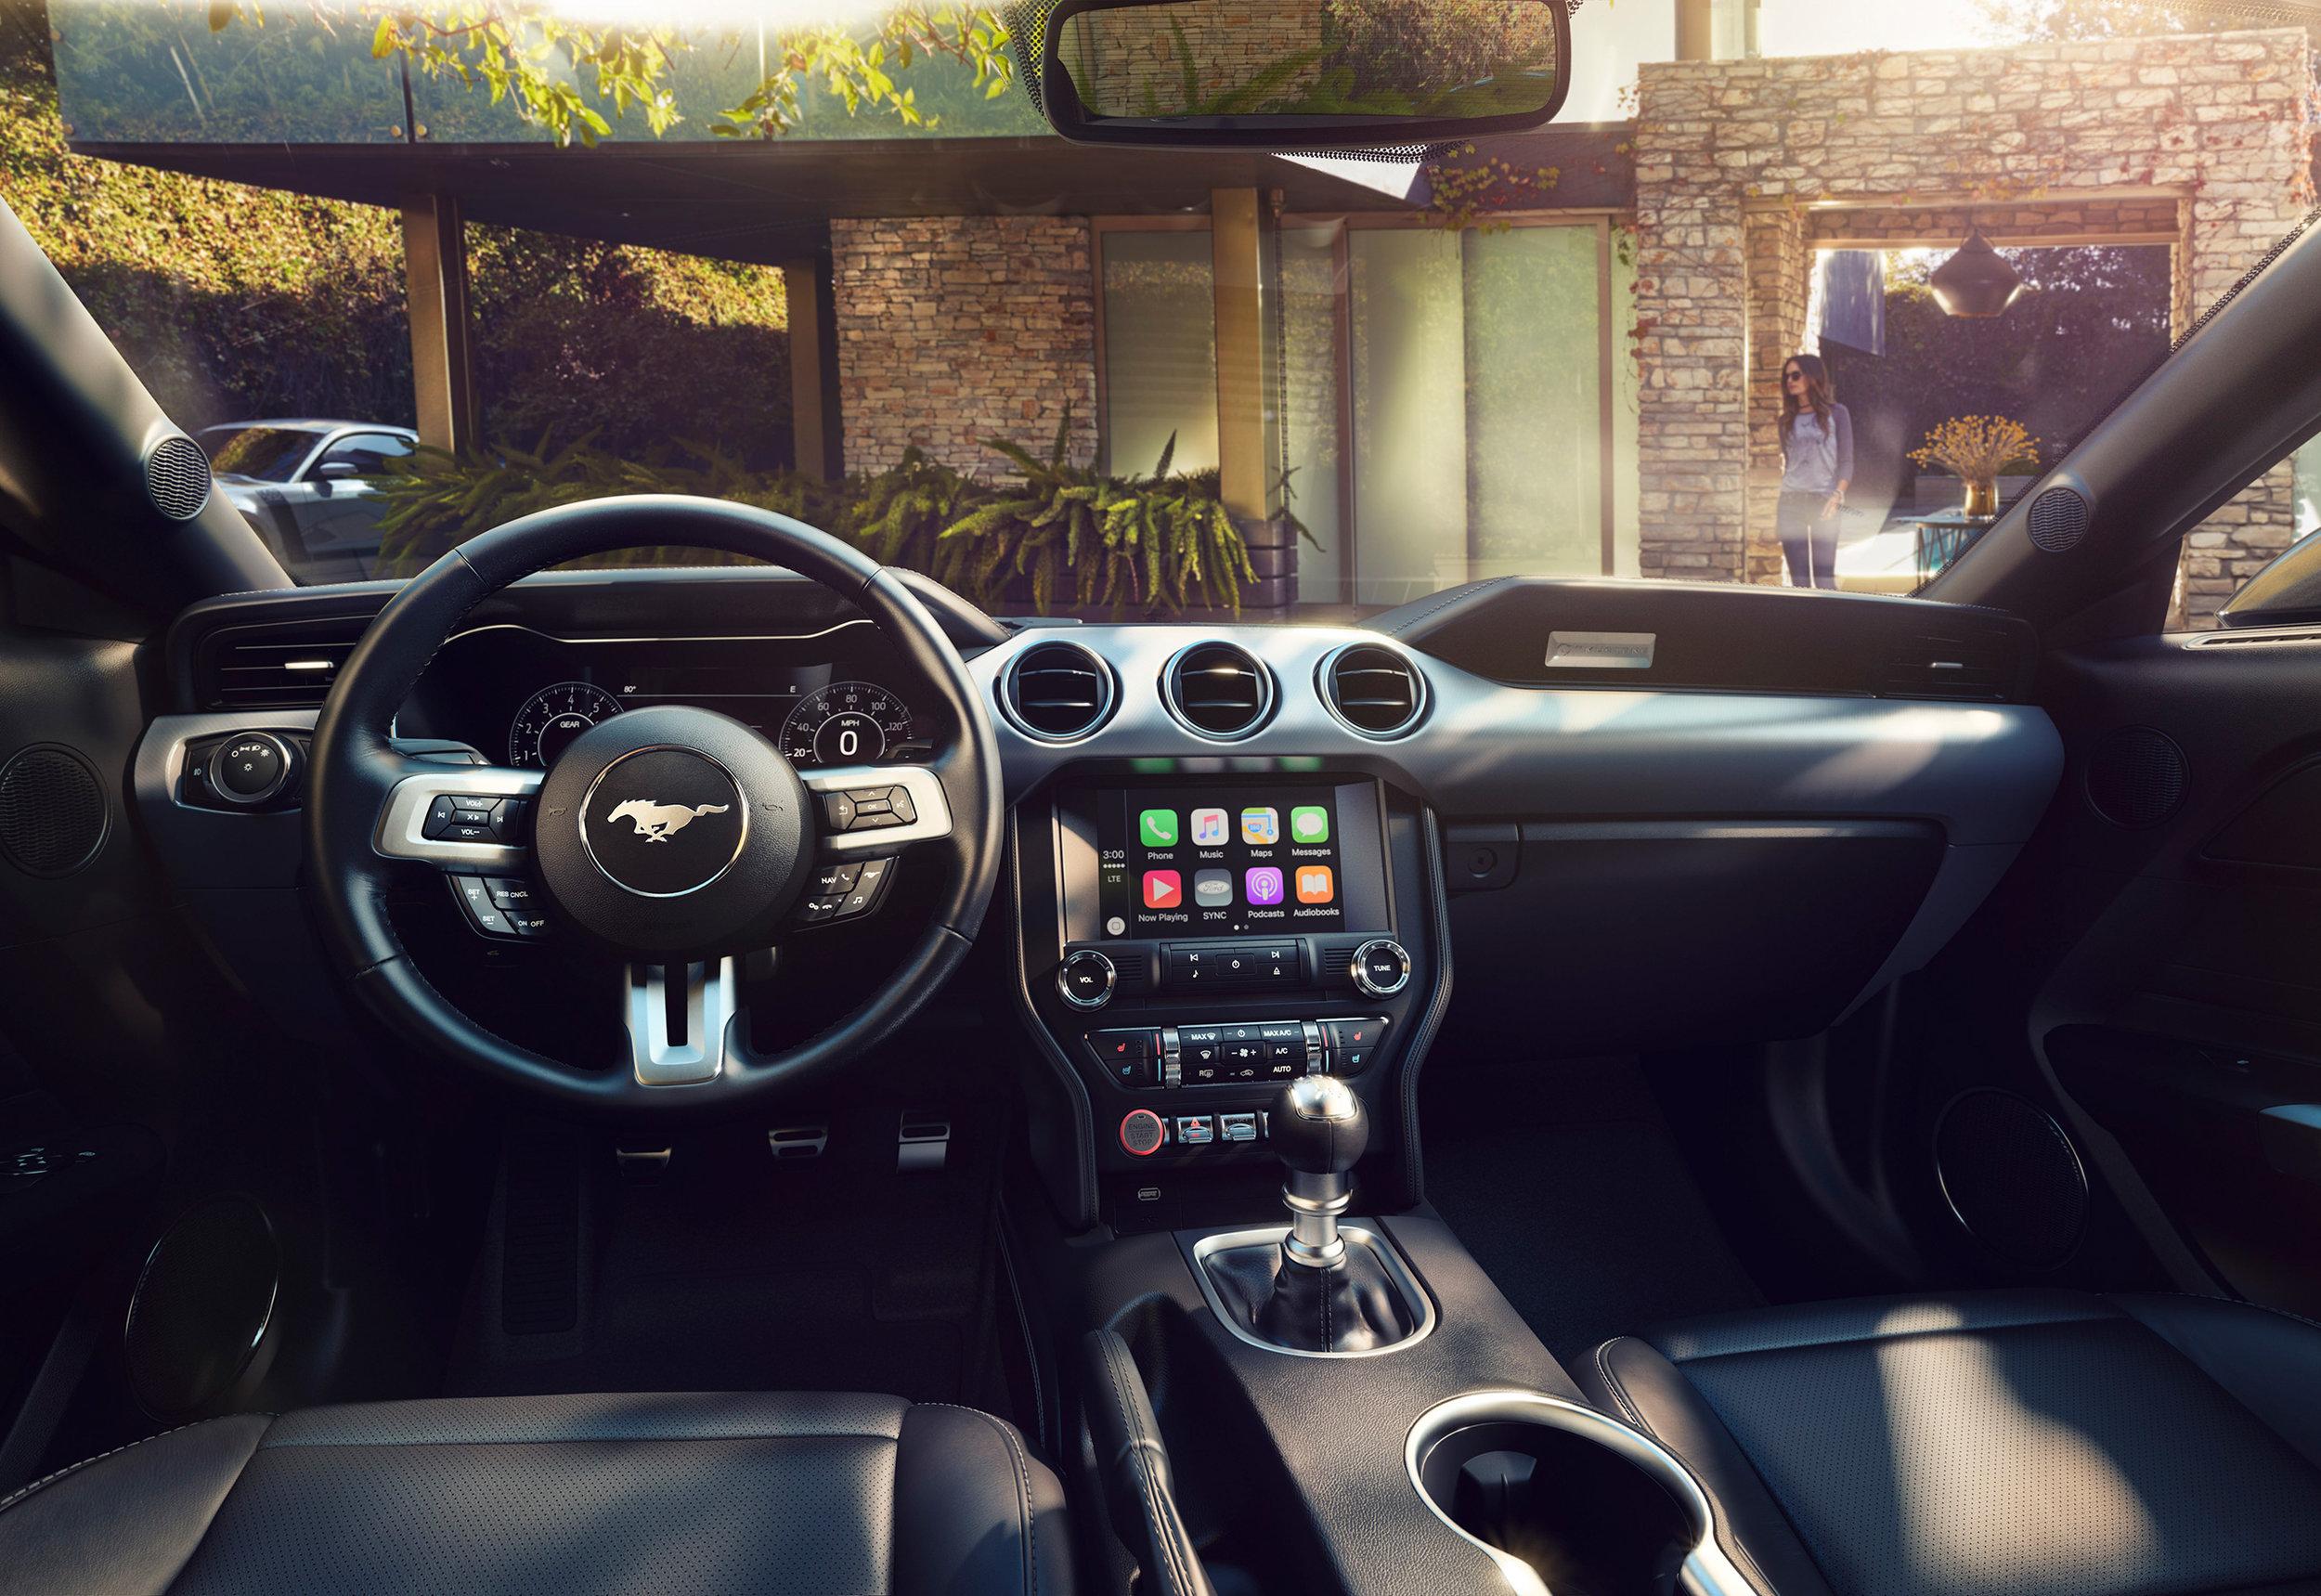 New-Ford-Mustang-Interior-1.jpg